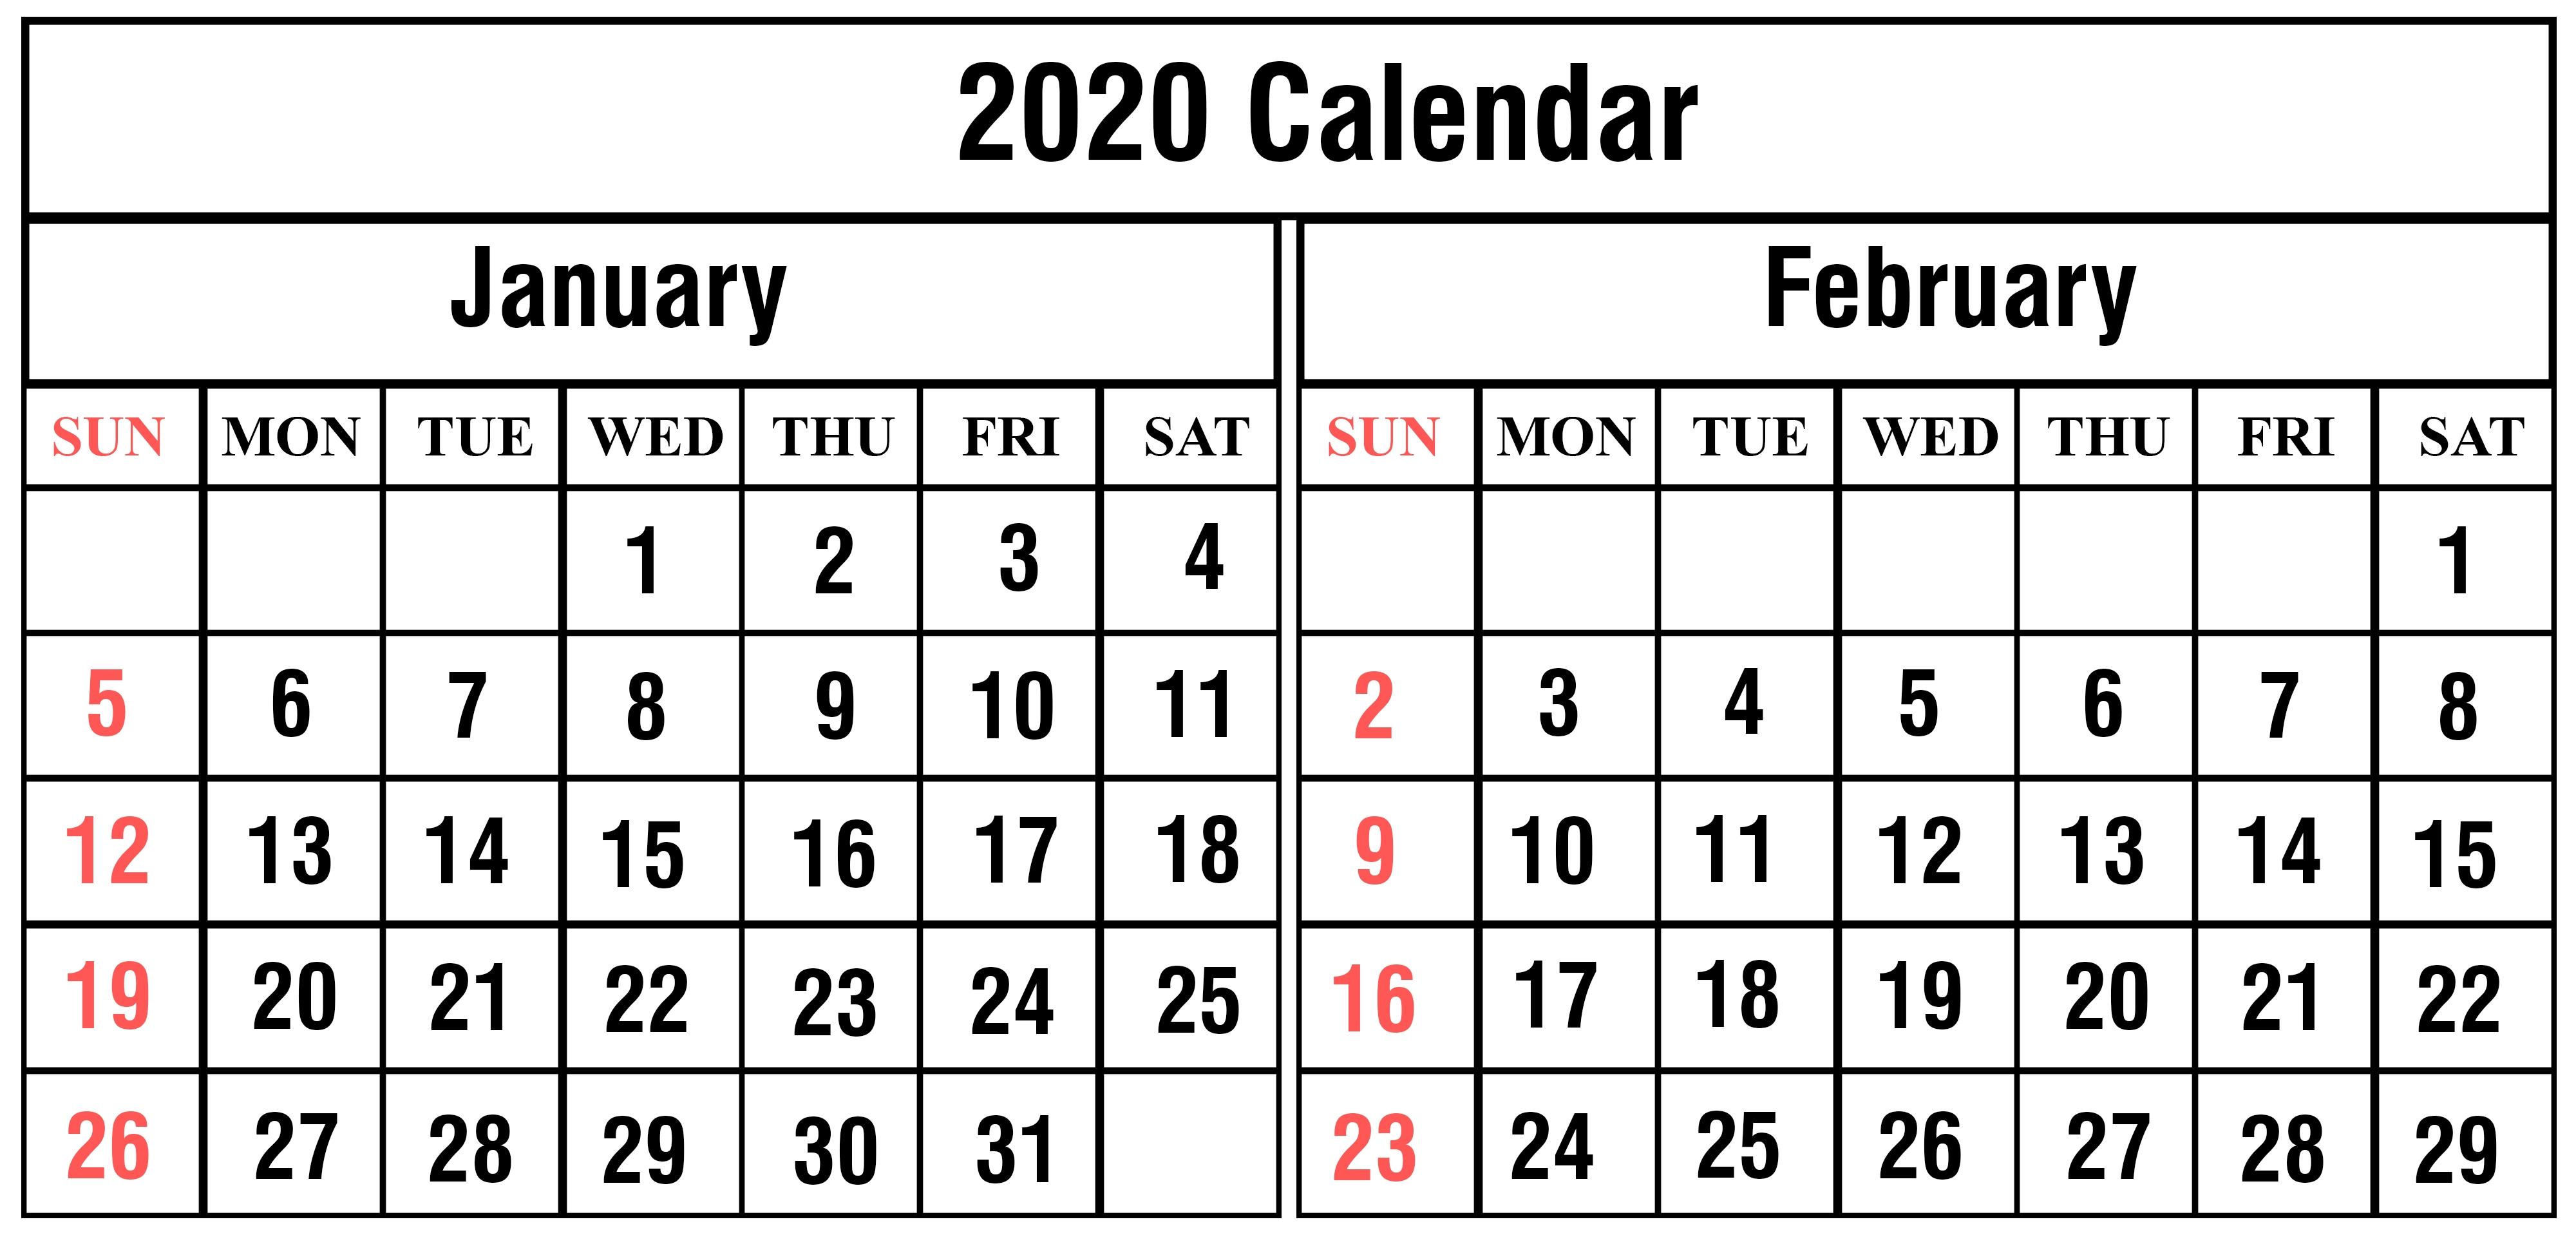 January February 2020 Calendar Printable Template Pdf Word-2020 Calendar January And February